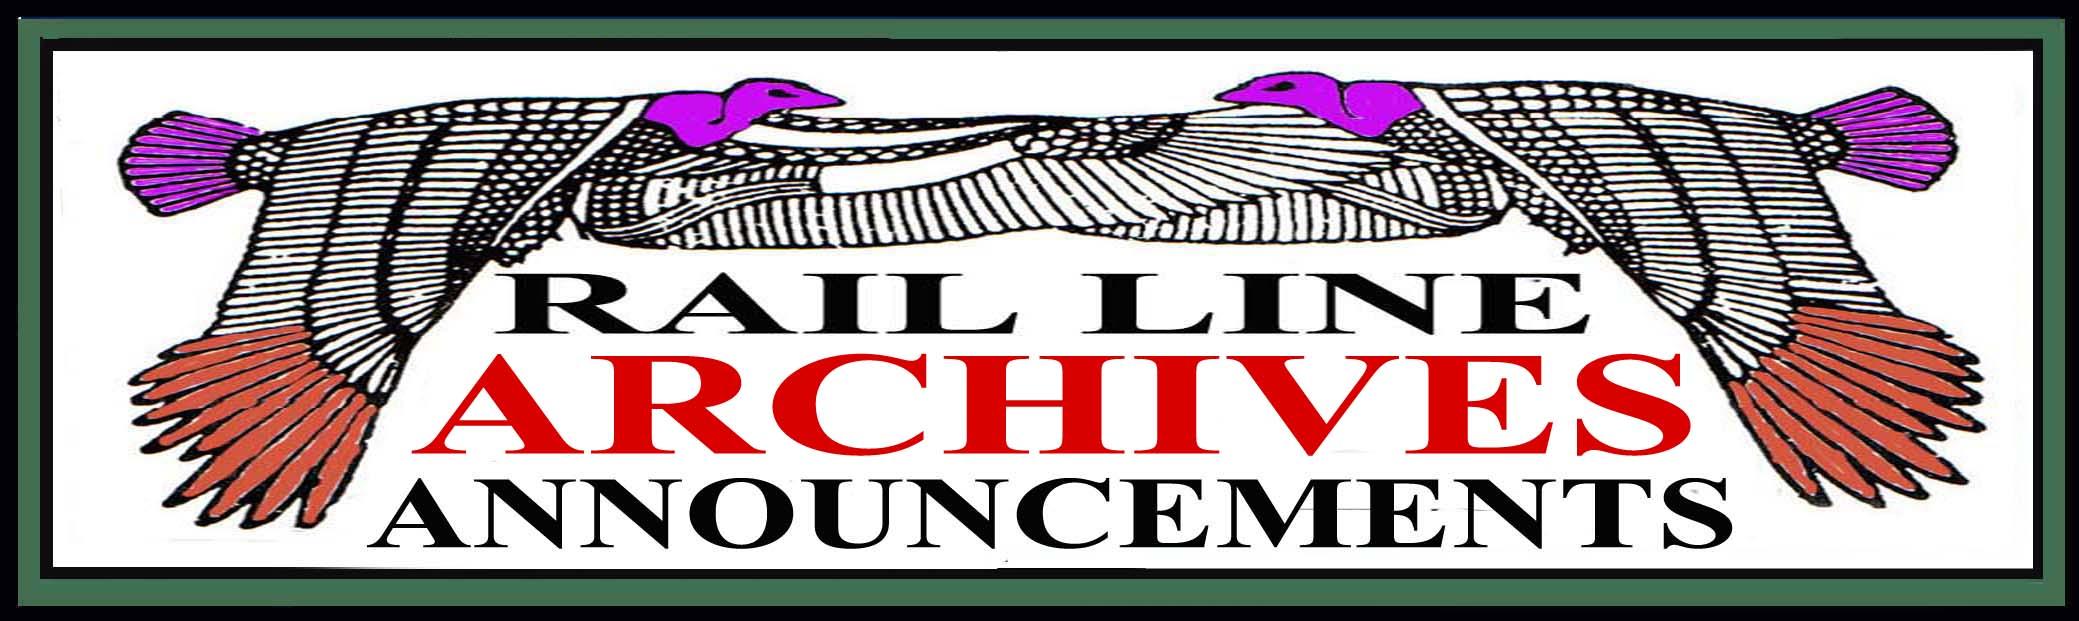 [Archives logo]